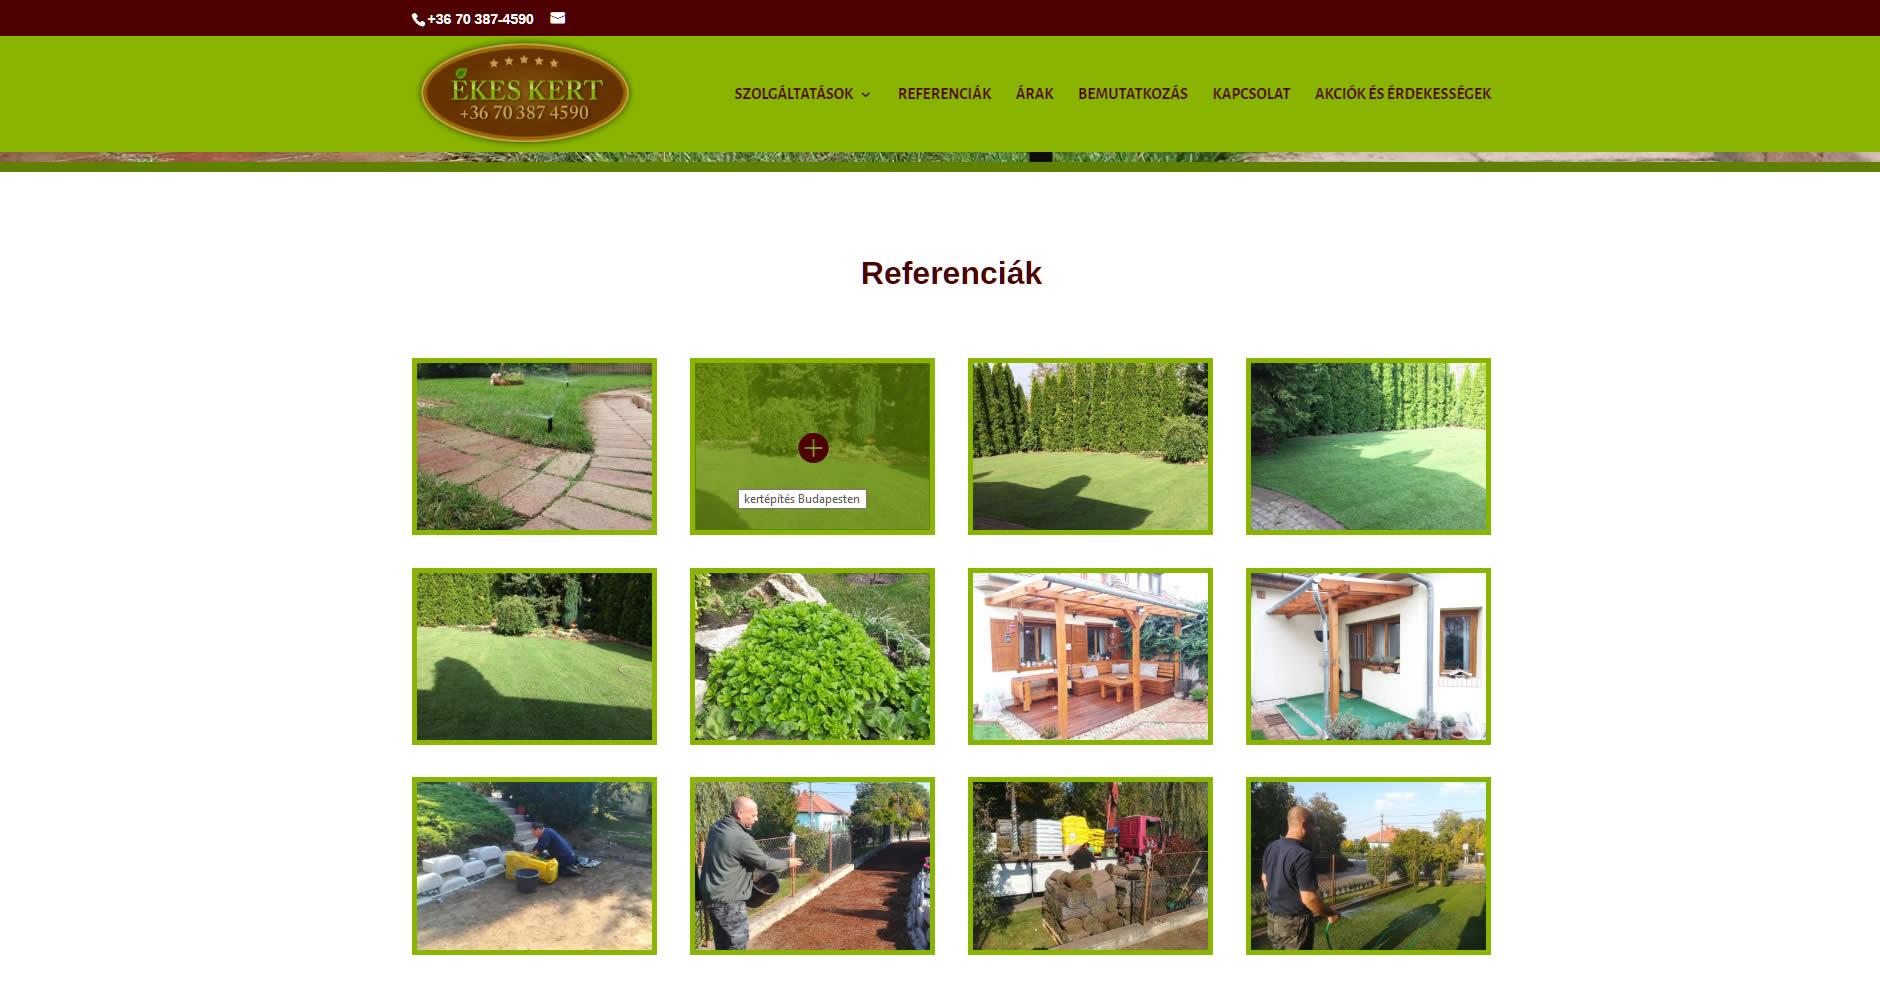 Ékeskert kert referenciák